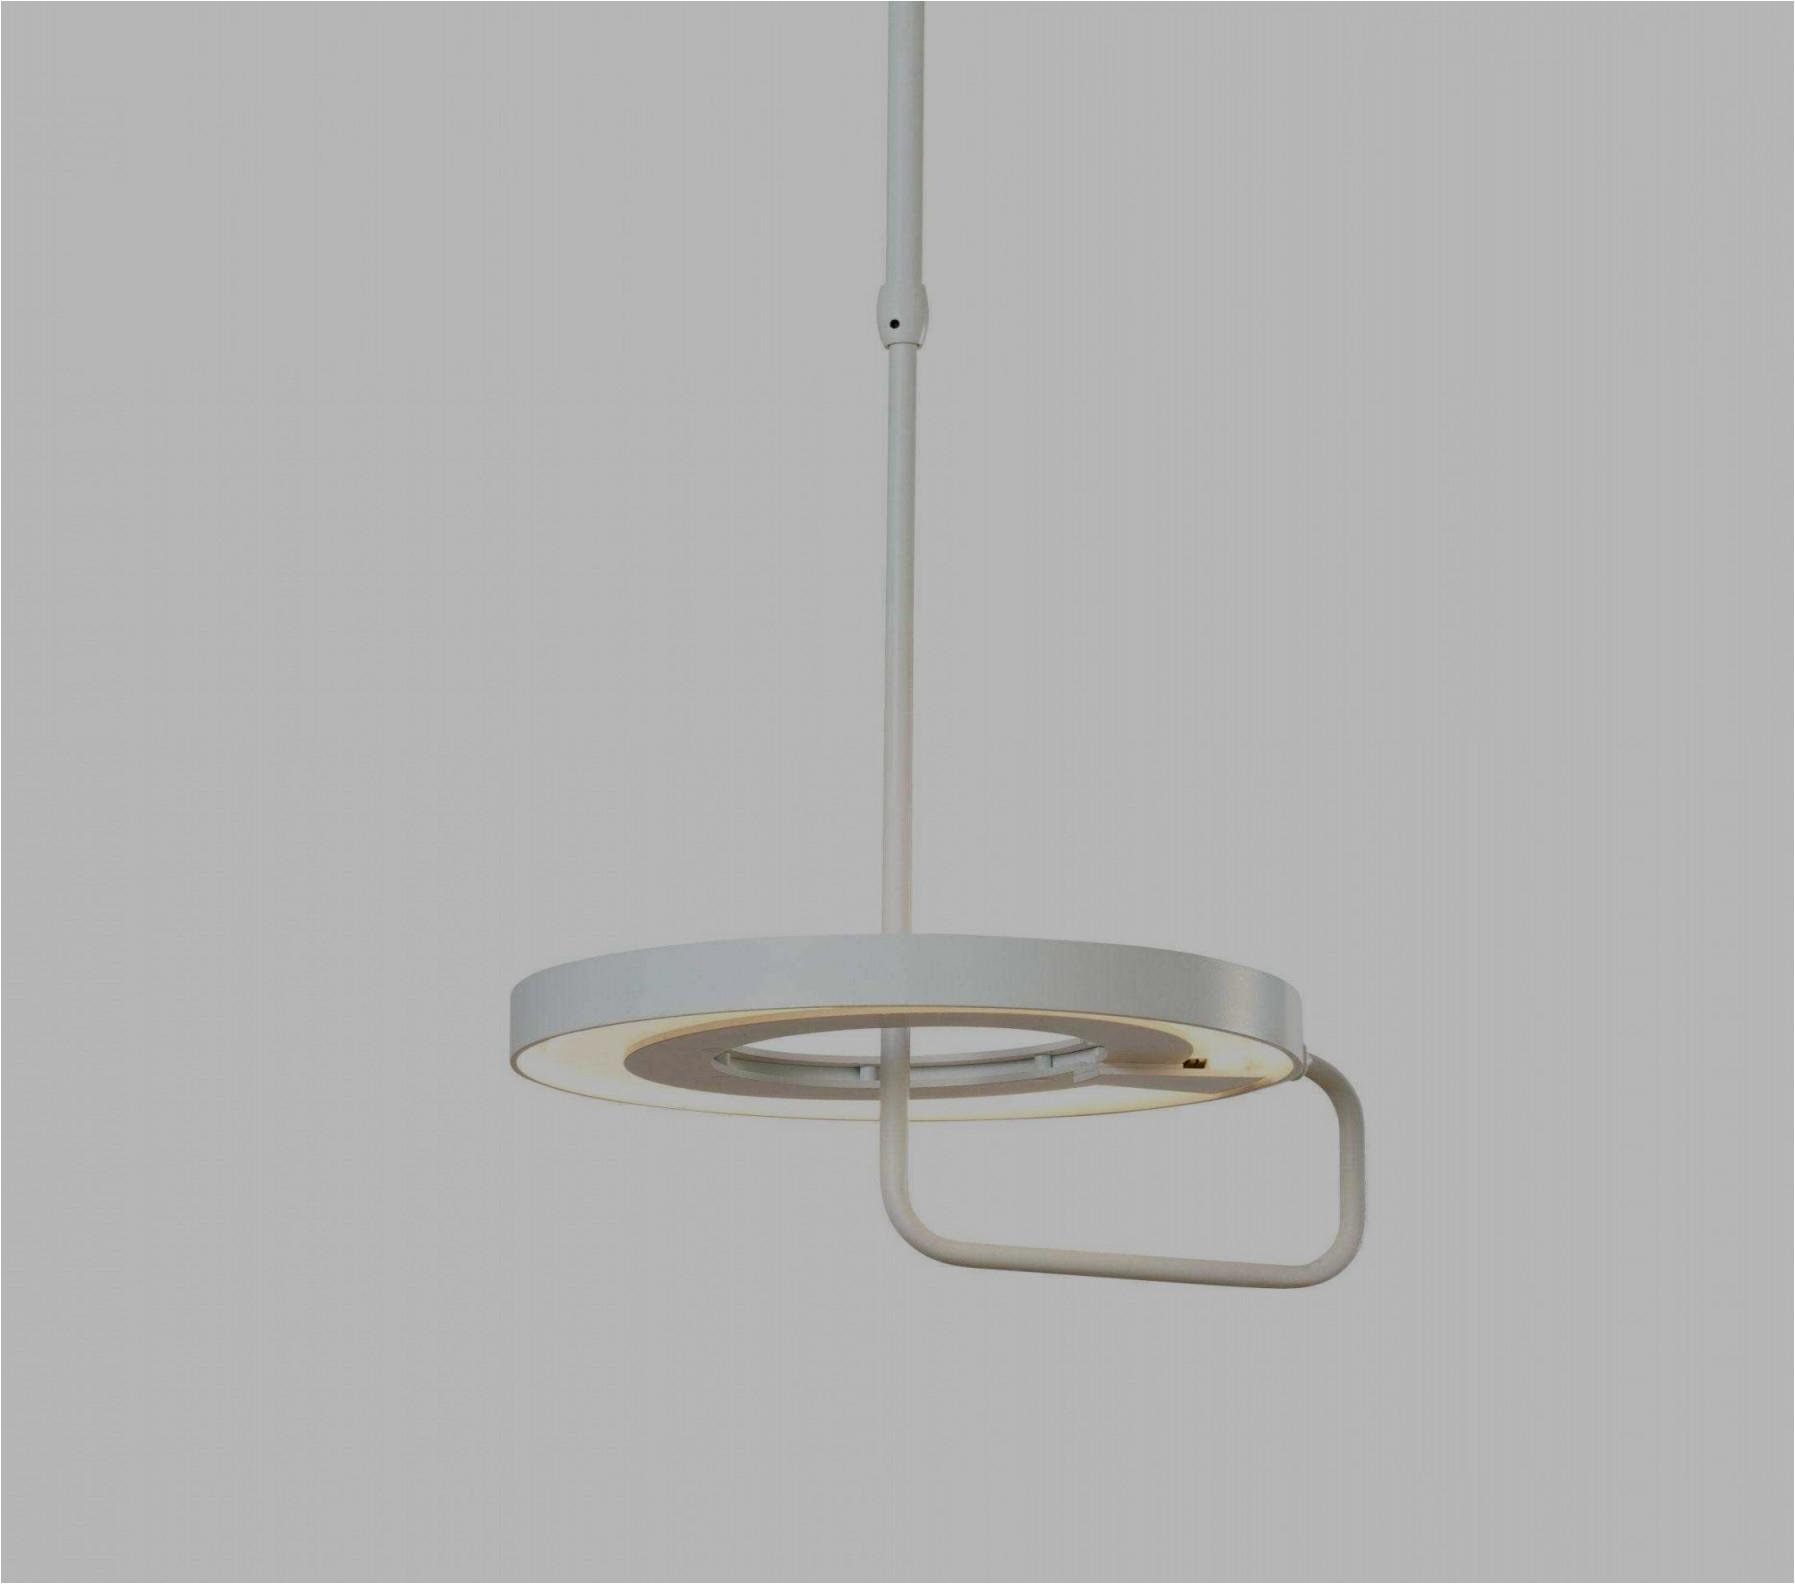 light bulb chandelier modern led pendant light fixtures unique 16 gem ring chandelier chb0039 0d for